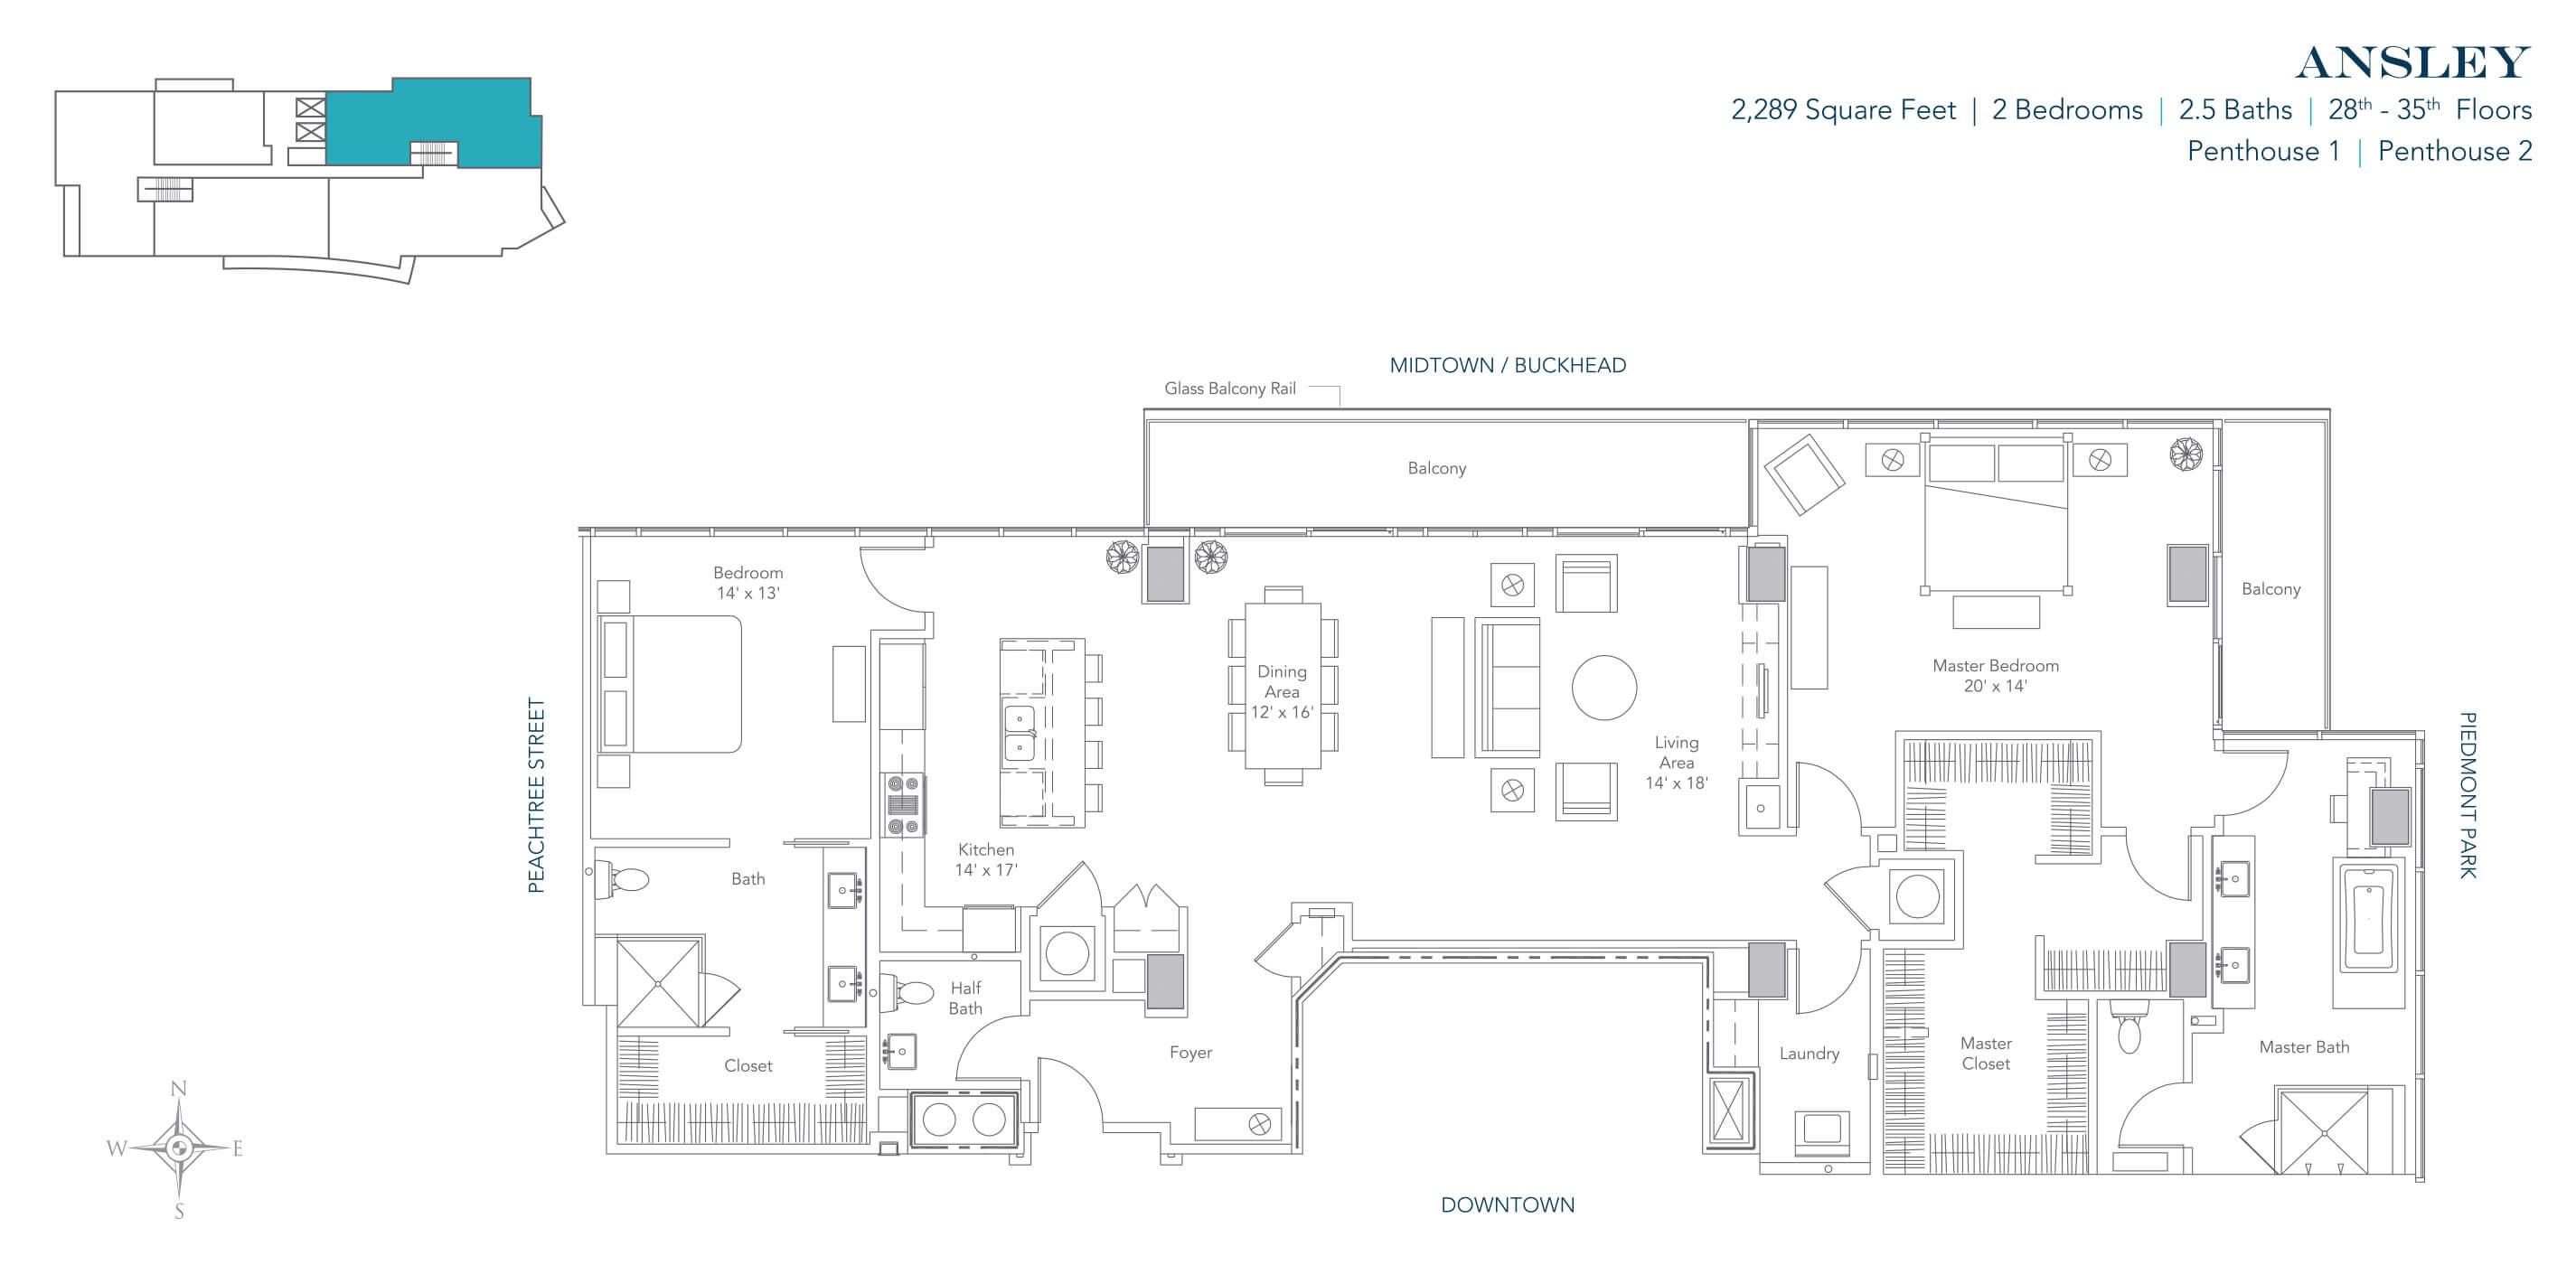 The Ansley Floor Plan: 1065 Midtown